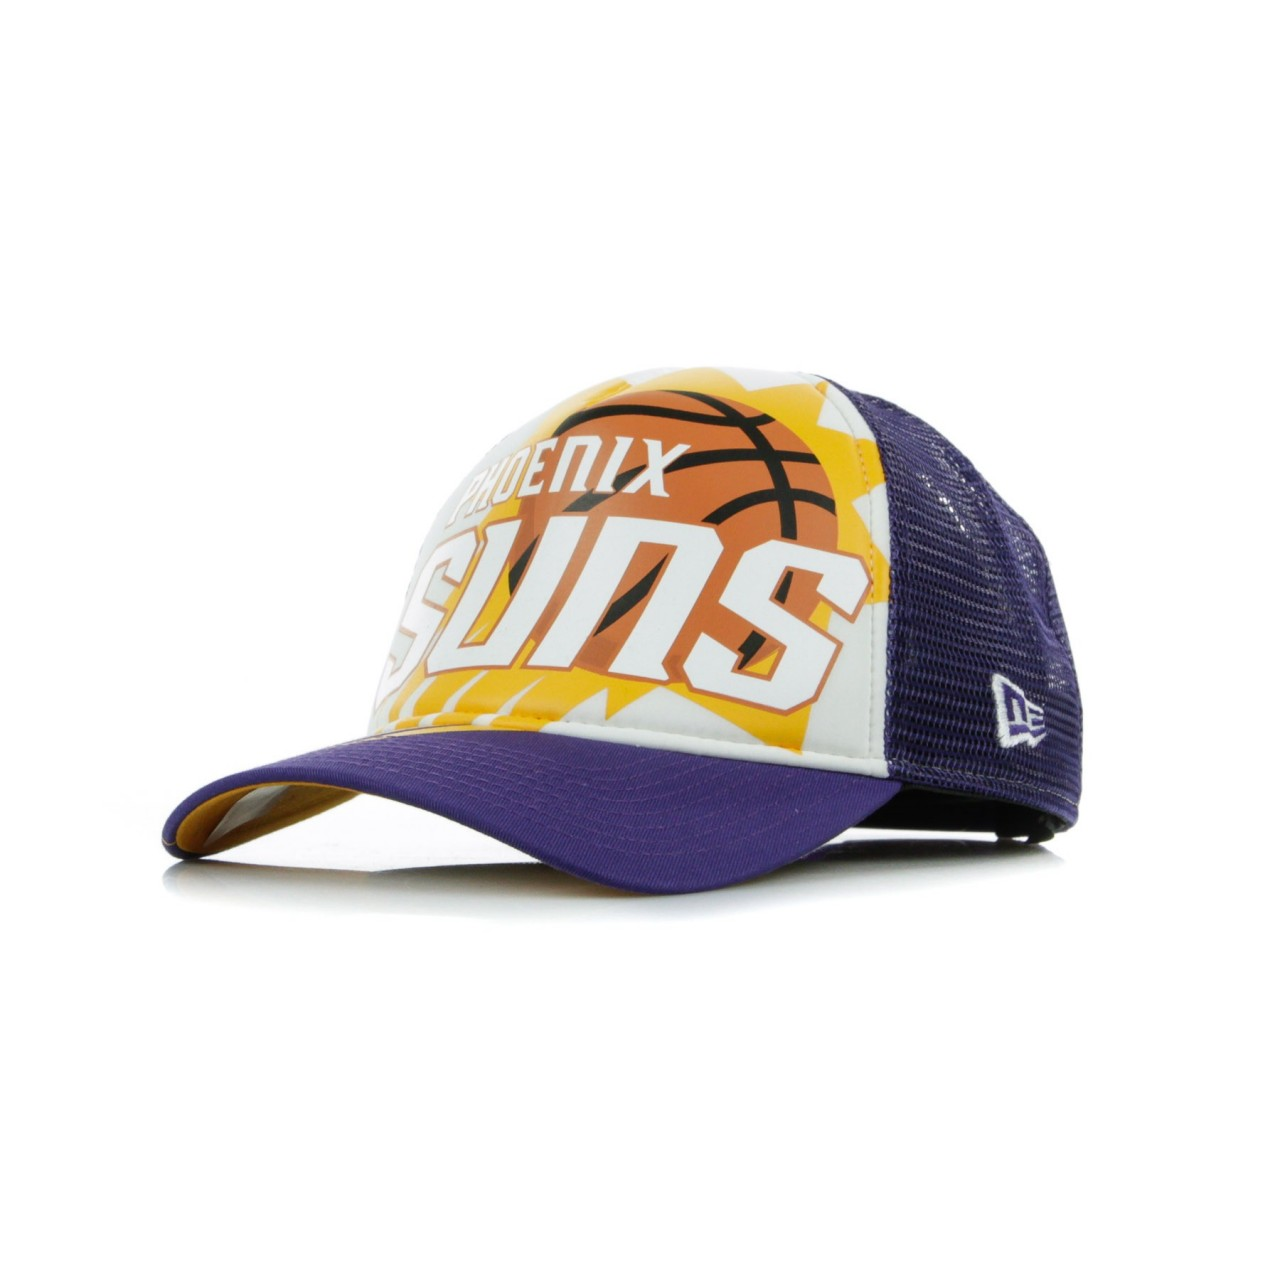 NEW ERA NBA RETRO PACK 940 AFRAME TRUCKER PHOSUN 11919859